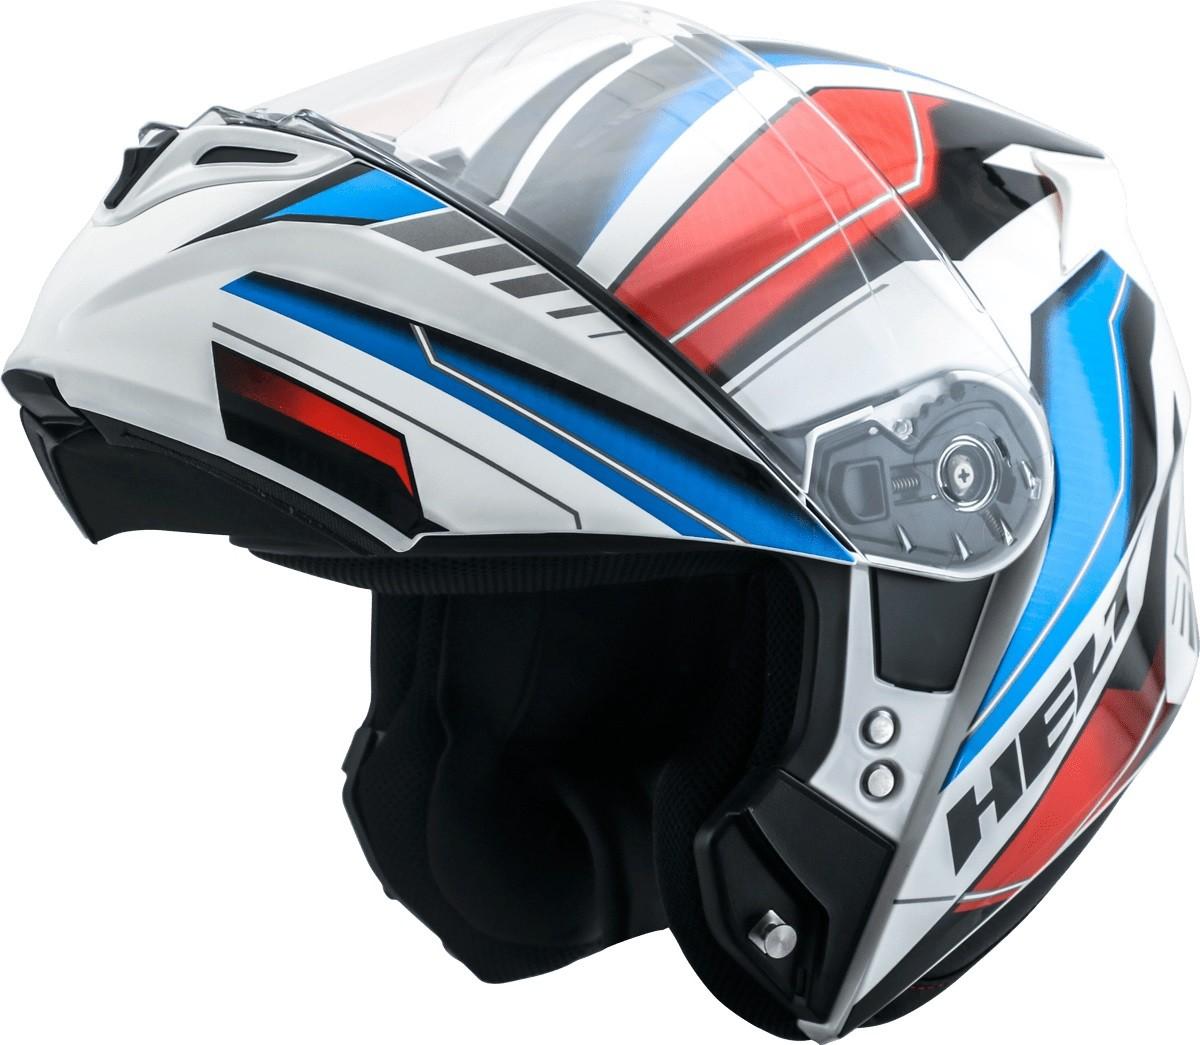 Capacete Helt Escamoteável 938 New Hippo Rider II